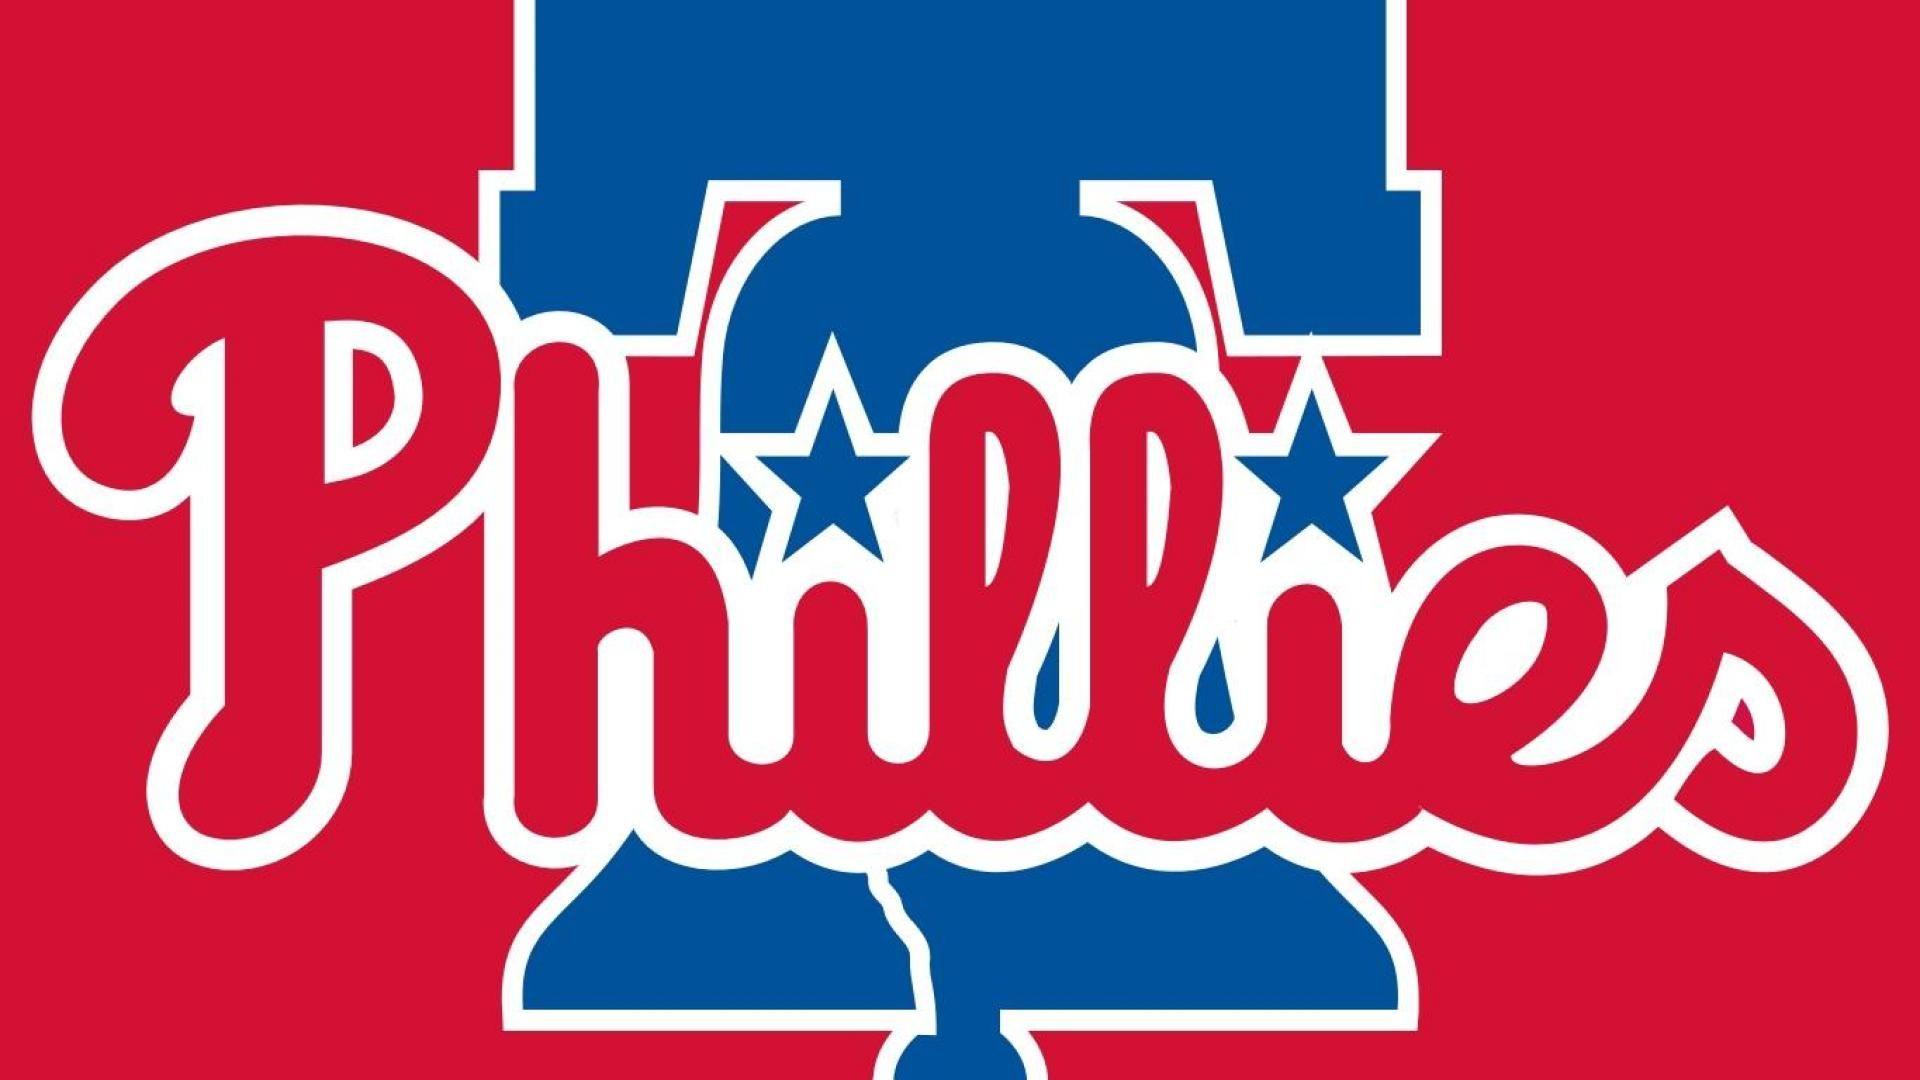 Phillies Logo 1080p Wallpaper